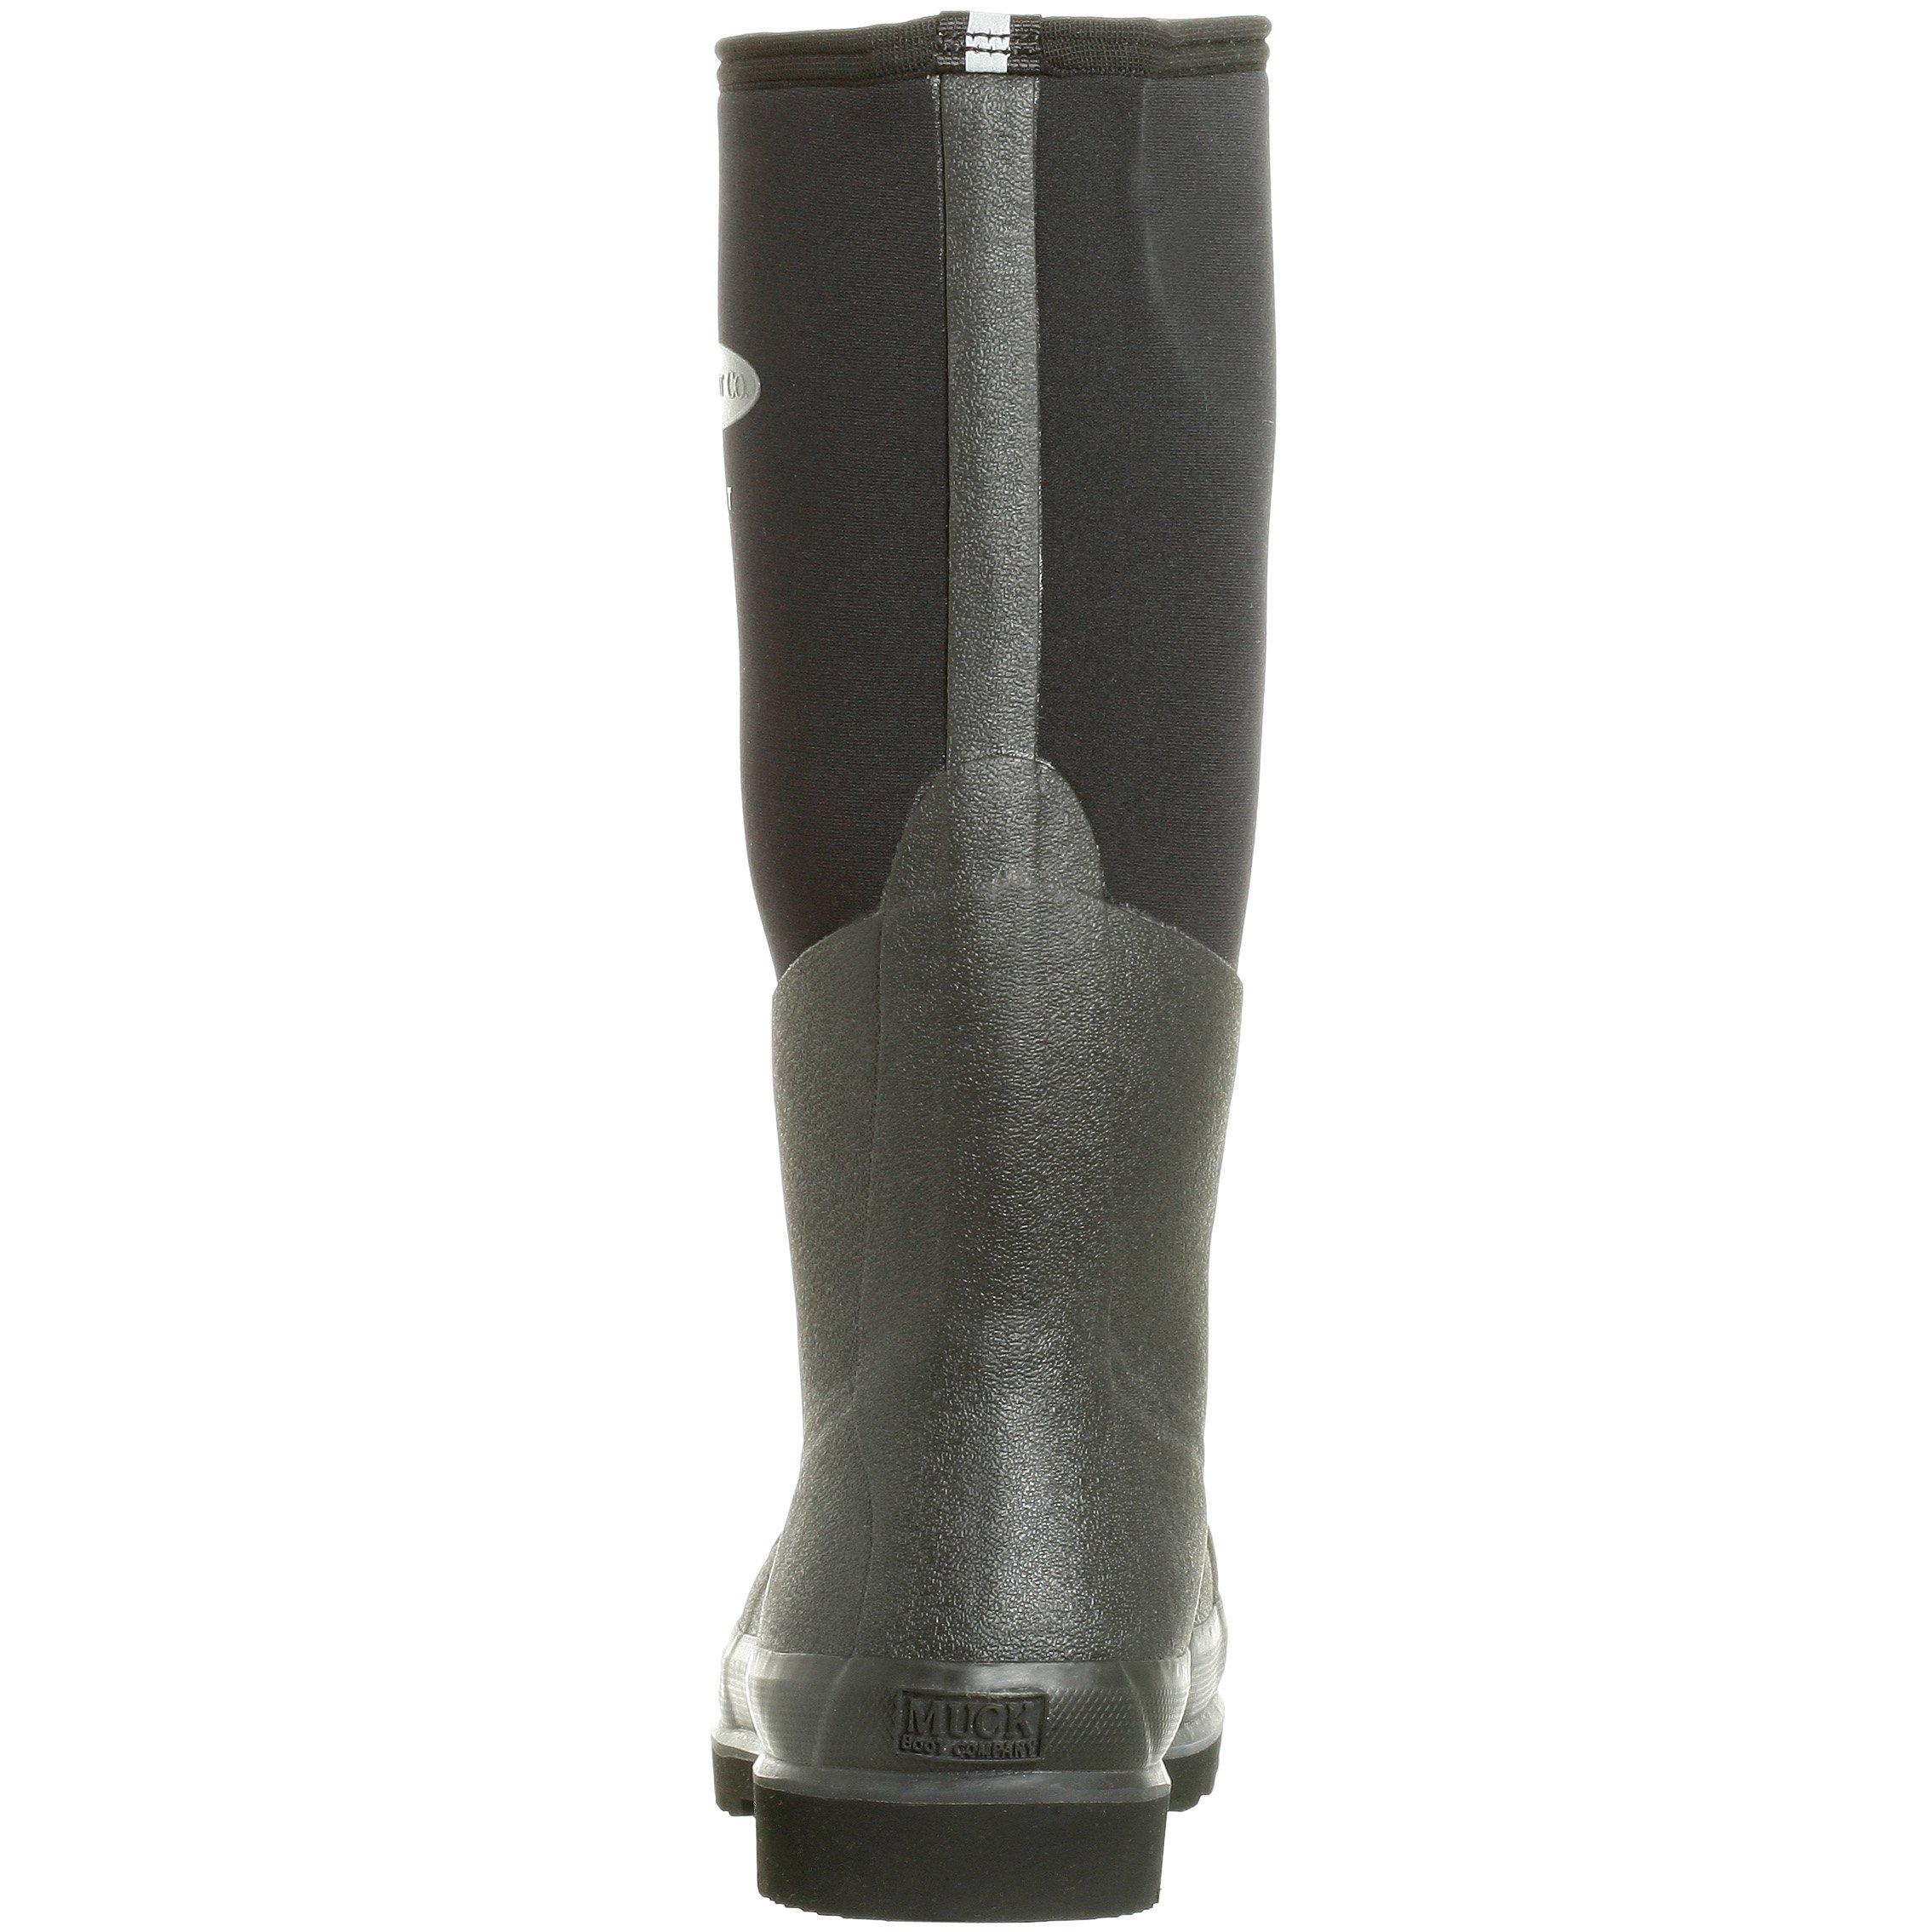 The Original MuckBoots Adult Chore Hi Boot Steel Toe,Black,Men's 12 M/Women's 13 M by Muck Boot (Image #2)